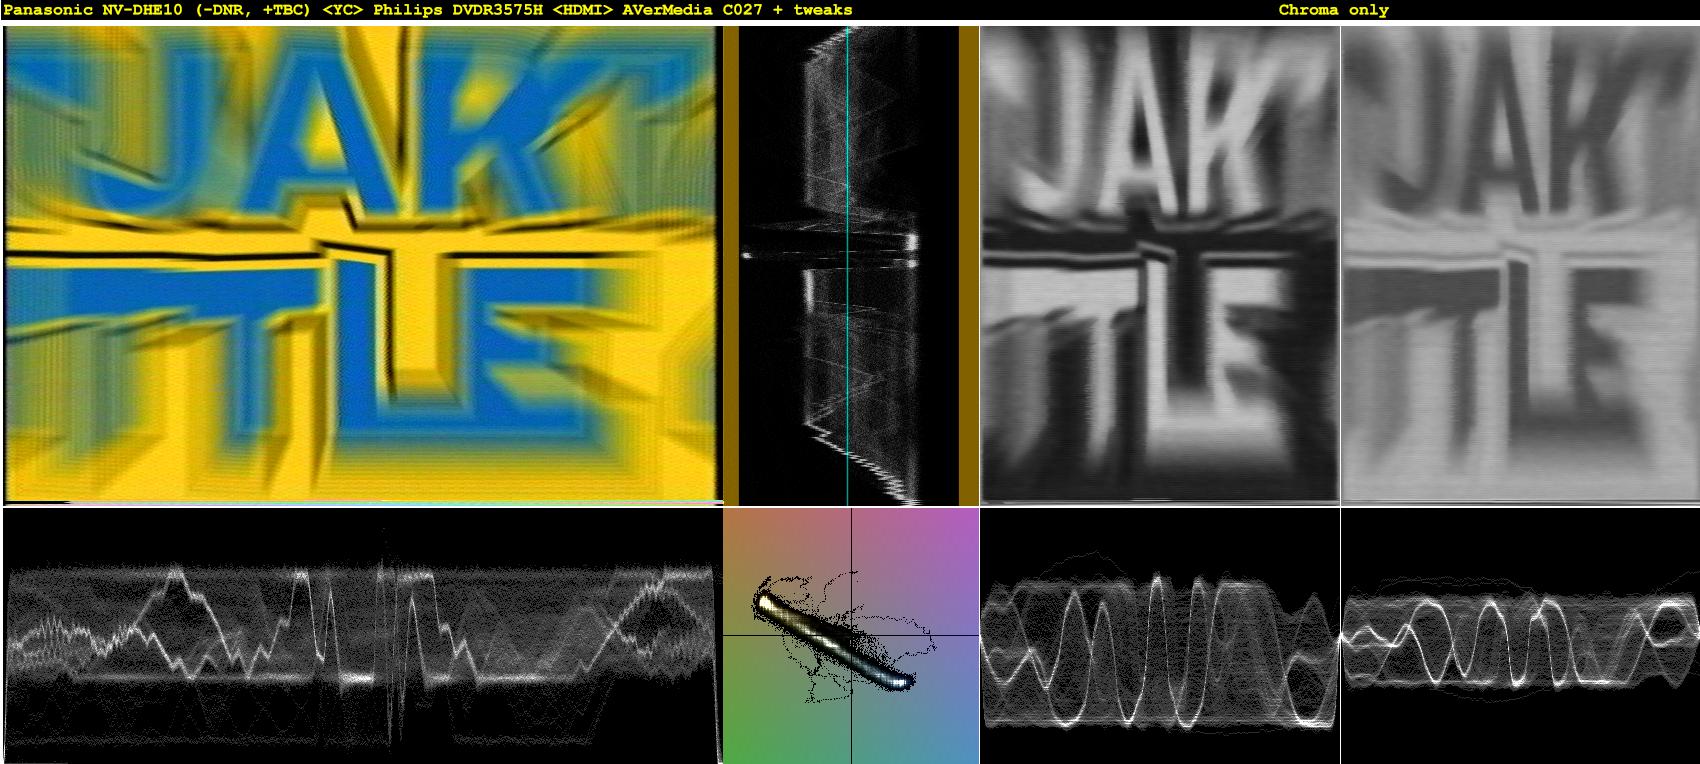 Click image for larger version  Name:0-05-05 - Panasonic NV-DHE10 (-DNR, +TBC).png Views:1038 Size:1.15 MB ID:38007